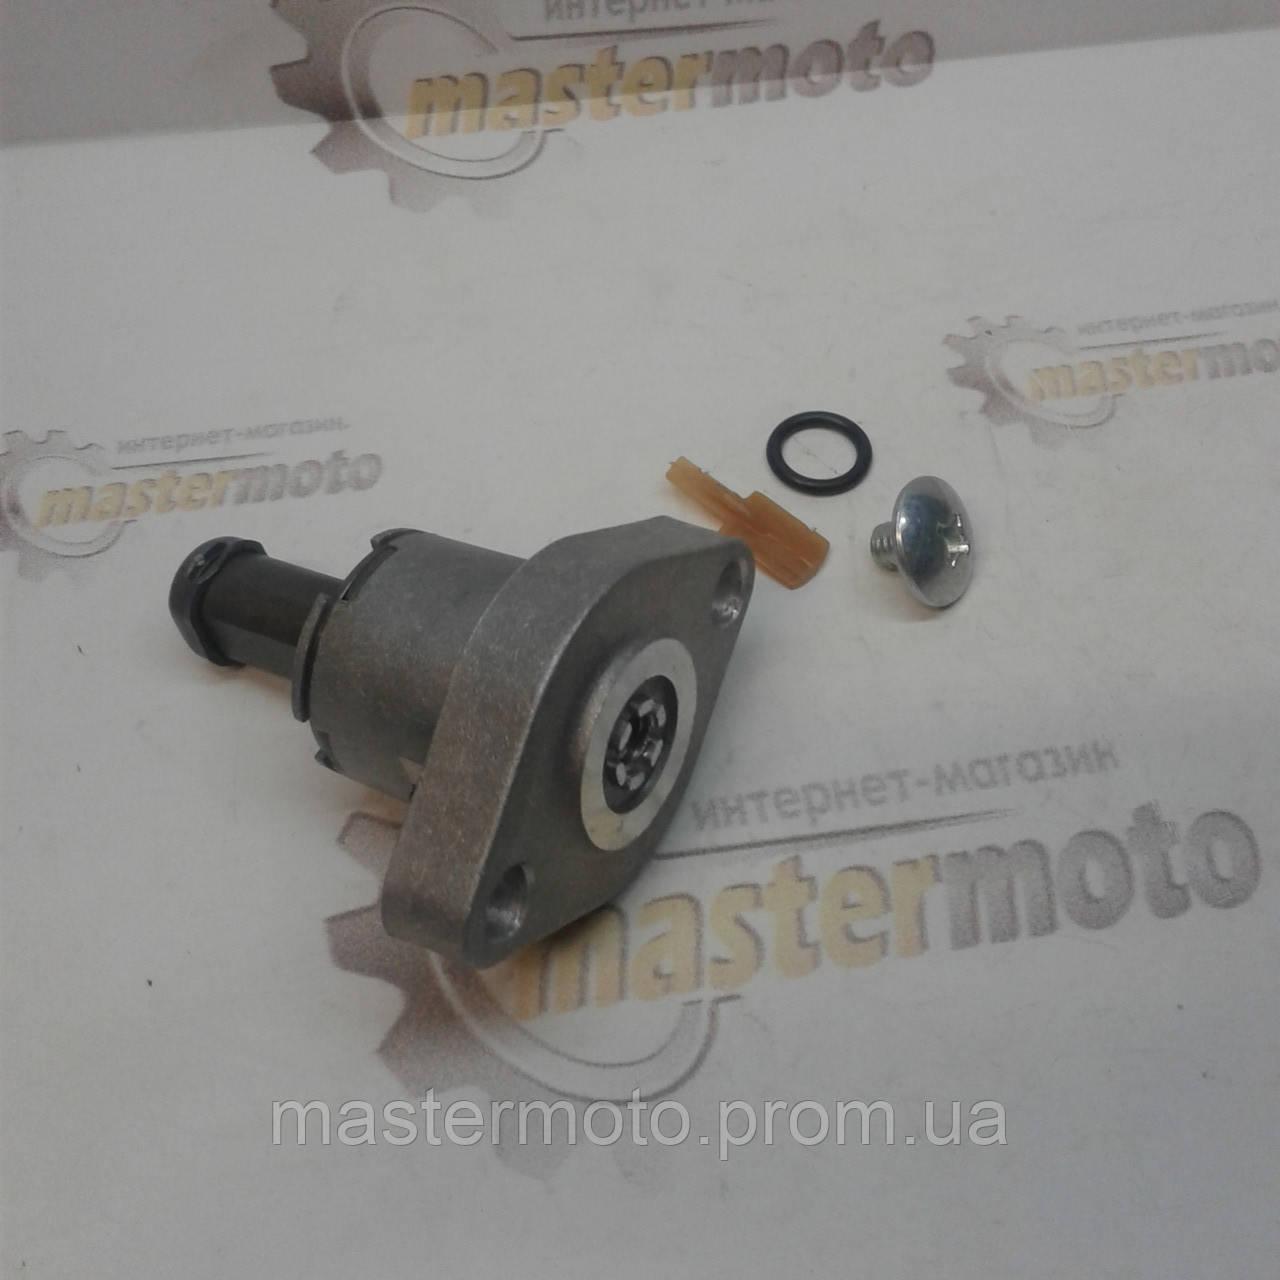 Натяжитель цепи ГРМ 4Т GY6 125/150 Mototech